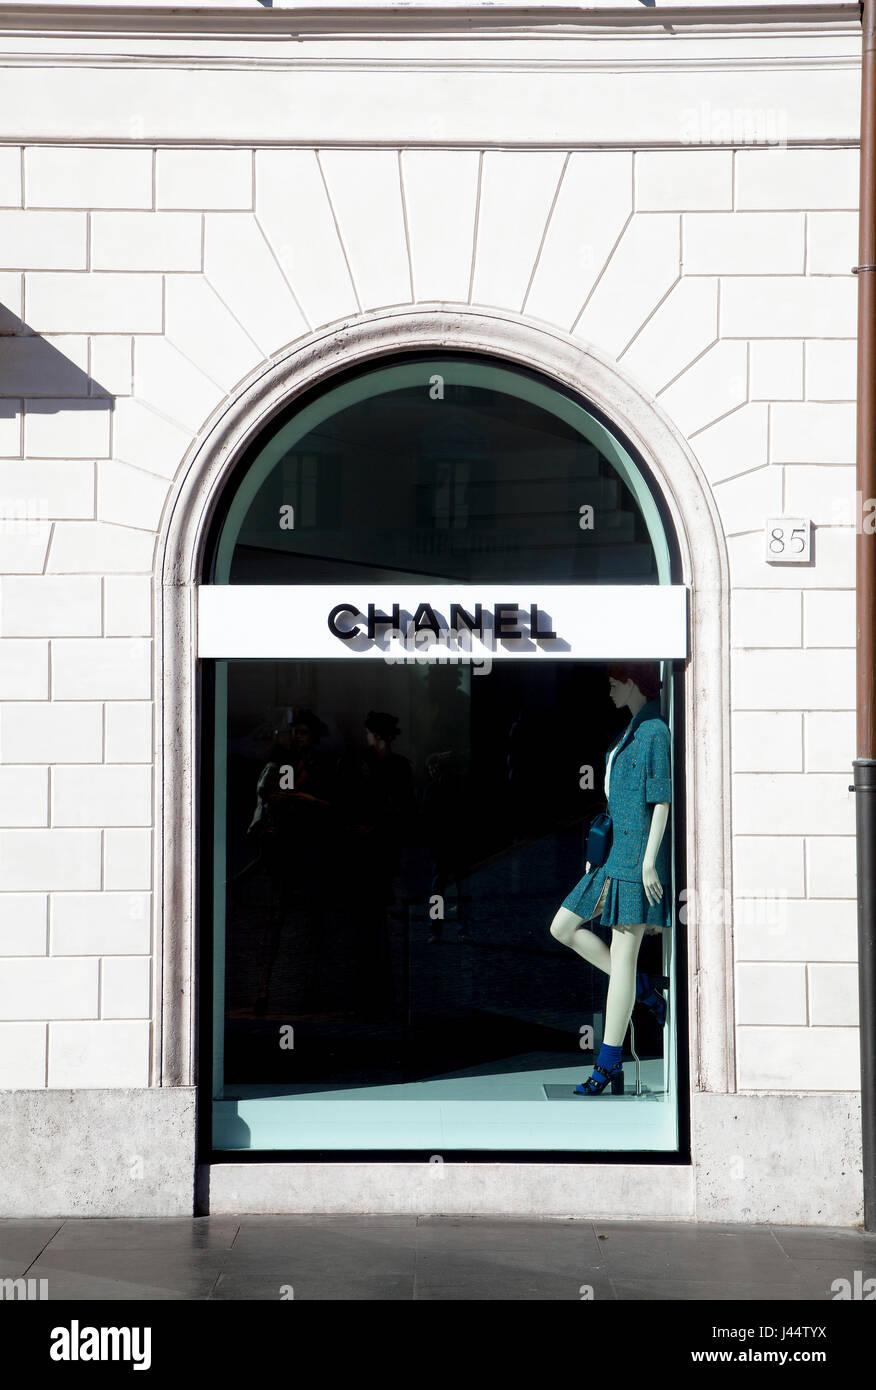 Boutique de mode de Chanel à Piazza di Spagna à Rome, Italie. Vitrine. ab08fefc969